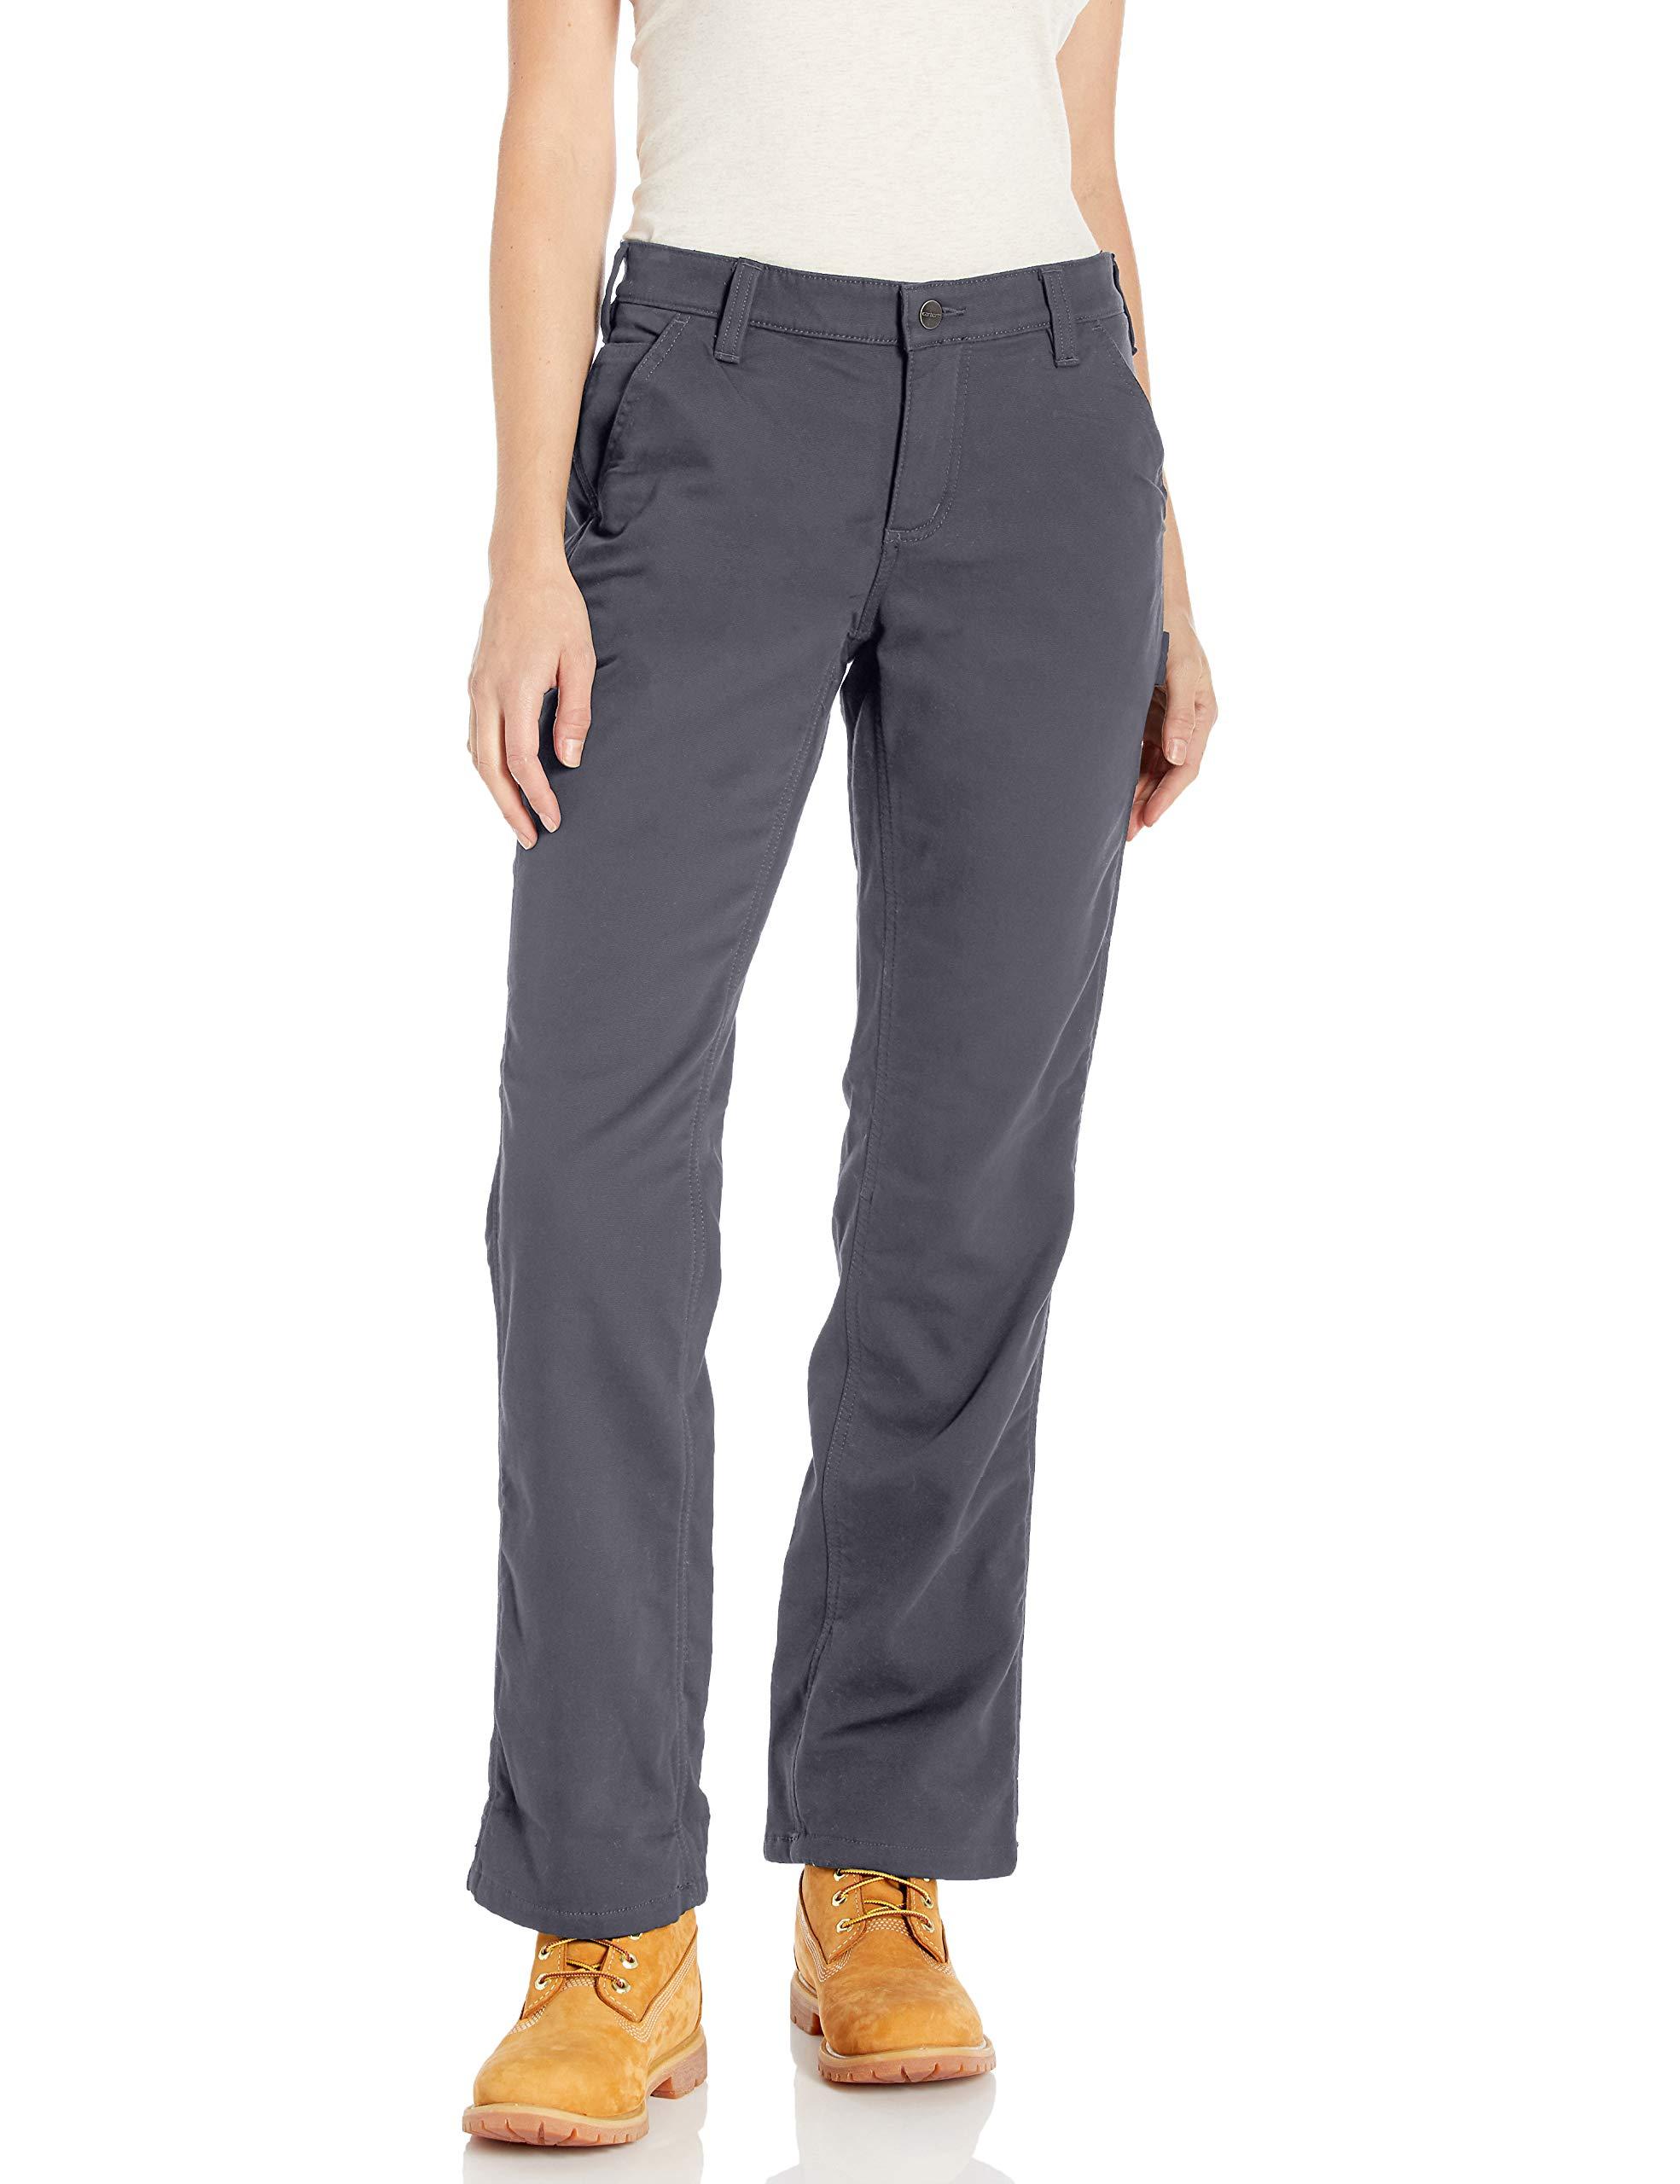 Carhartt Women's Original Fit Fleece Lined Crawford Pant